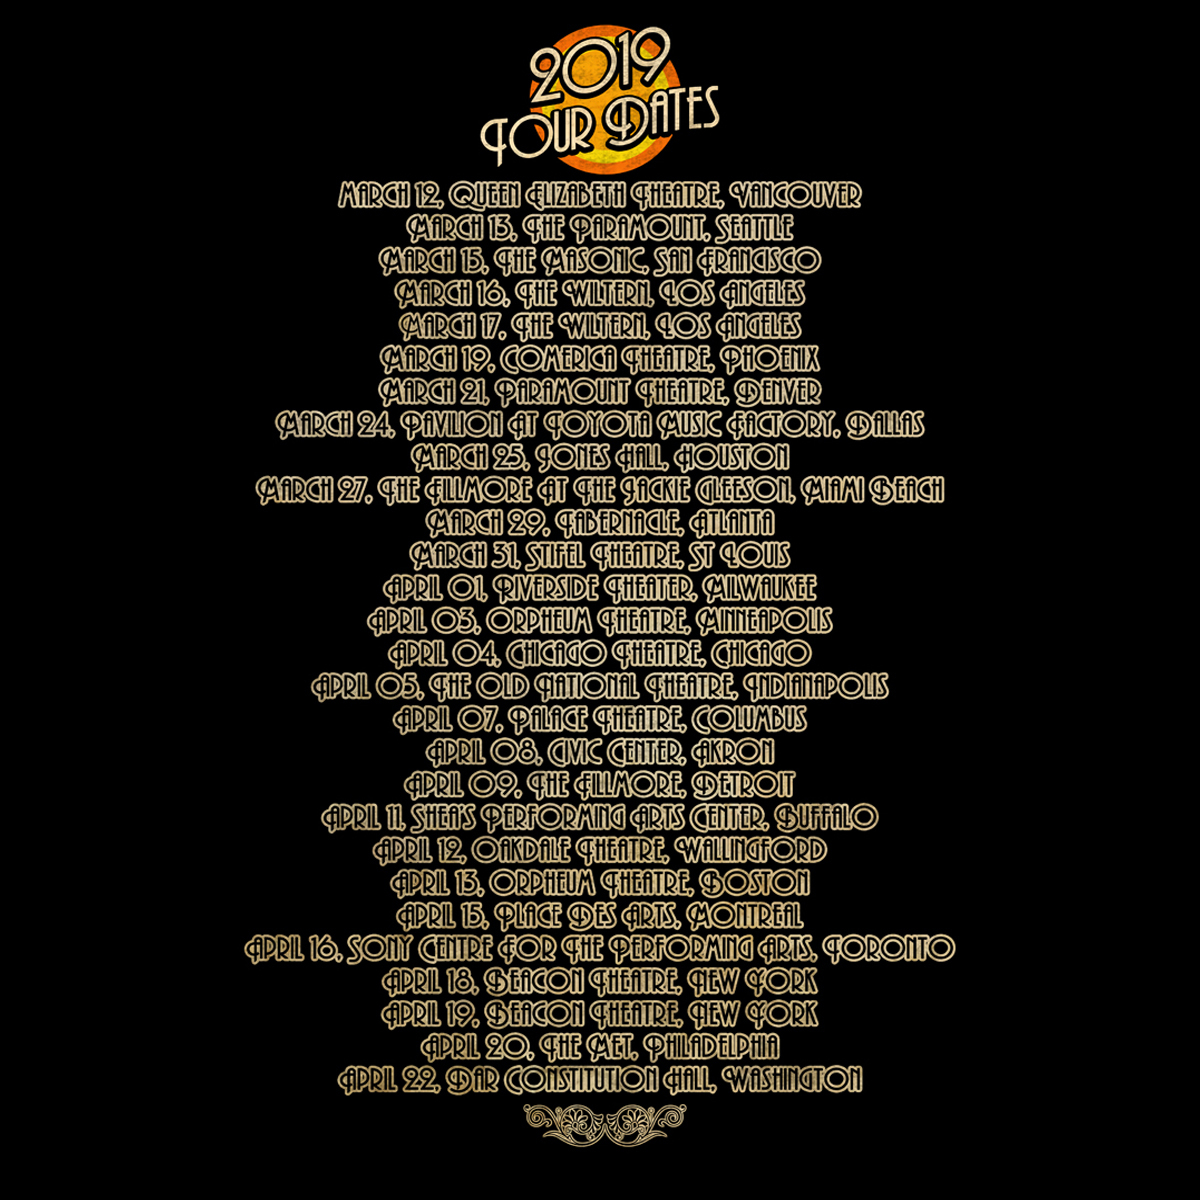 2019 Saucerful of Secrets Tour Dateback T-shirt